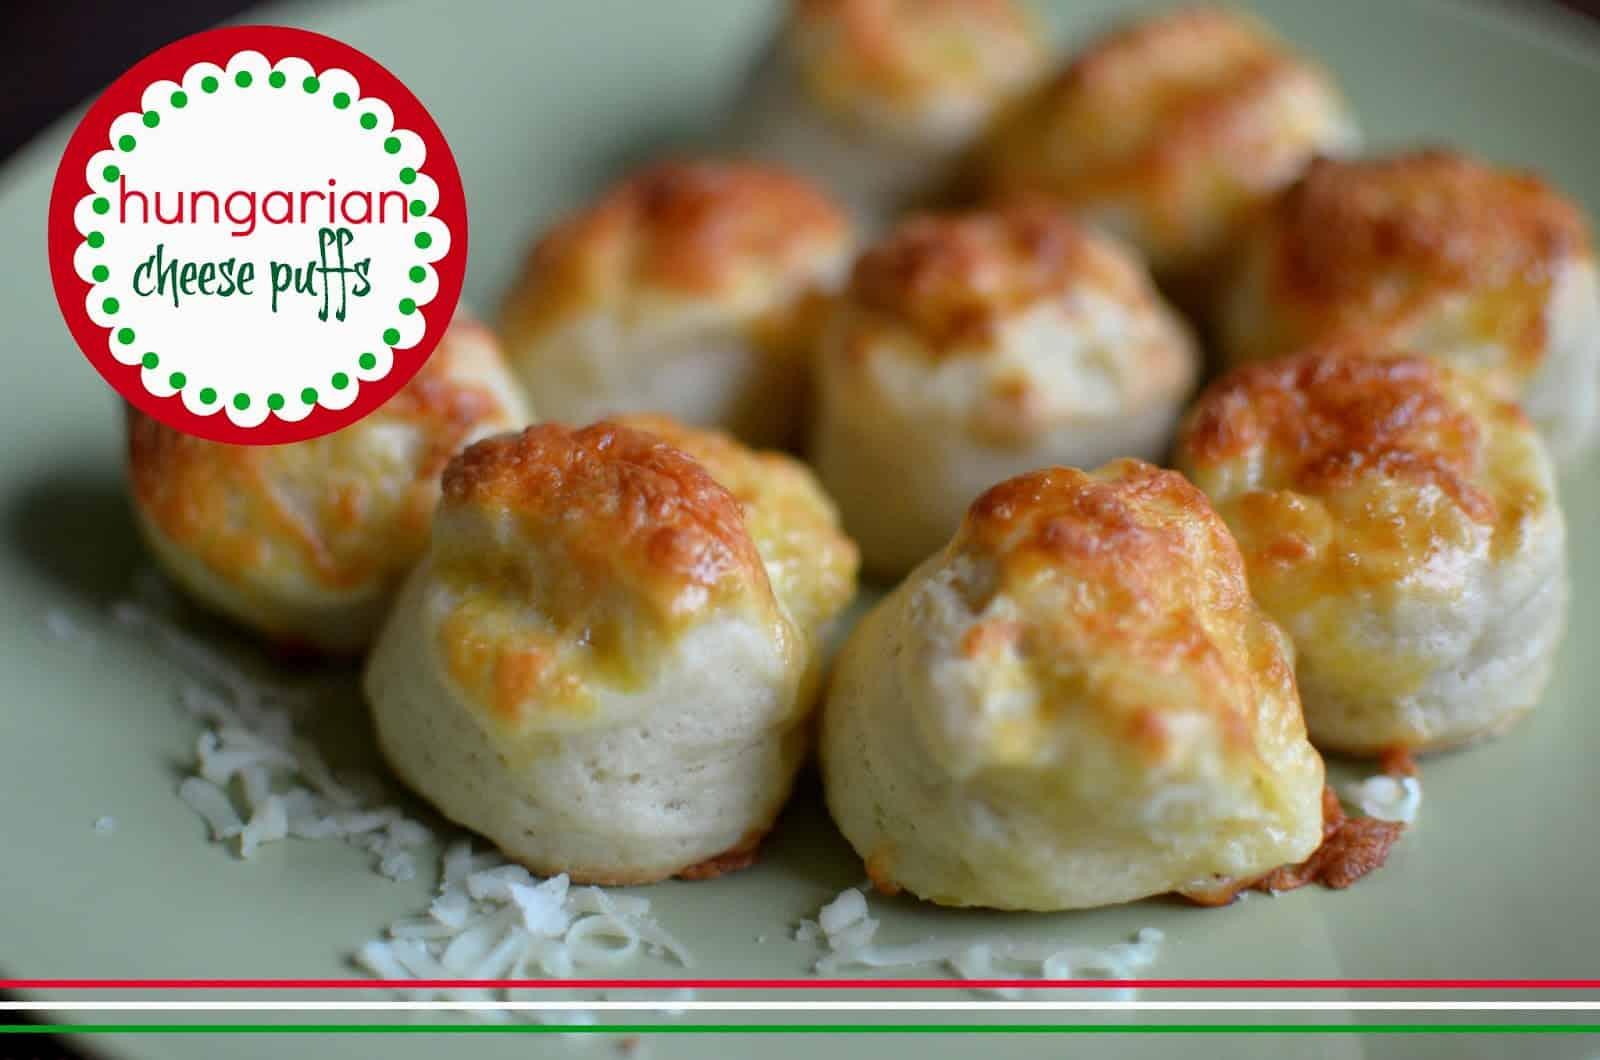 Hungarian Cheese puffs